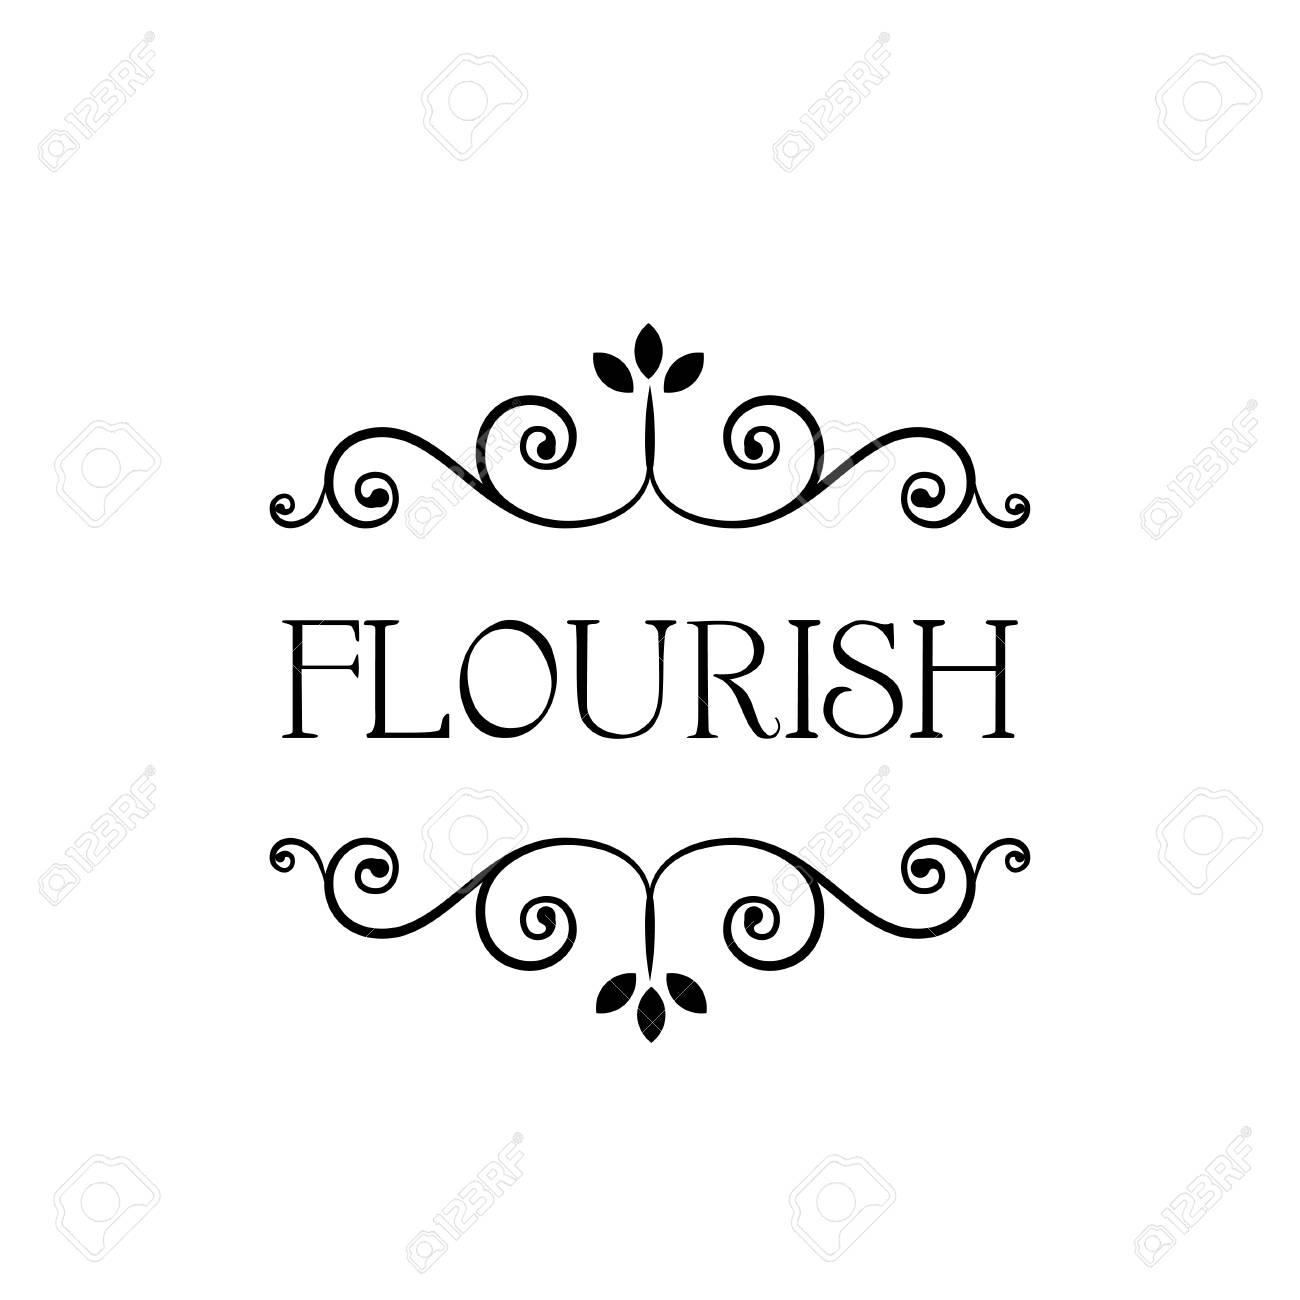 Floral Frame Ornaments Decoration Graphics Border Vintage Flourish Classic Wedding Clipart Transparent Background Label Tag 0507